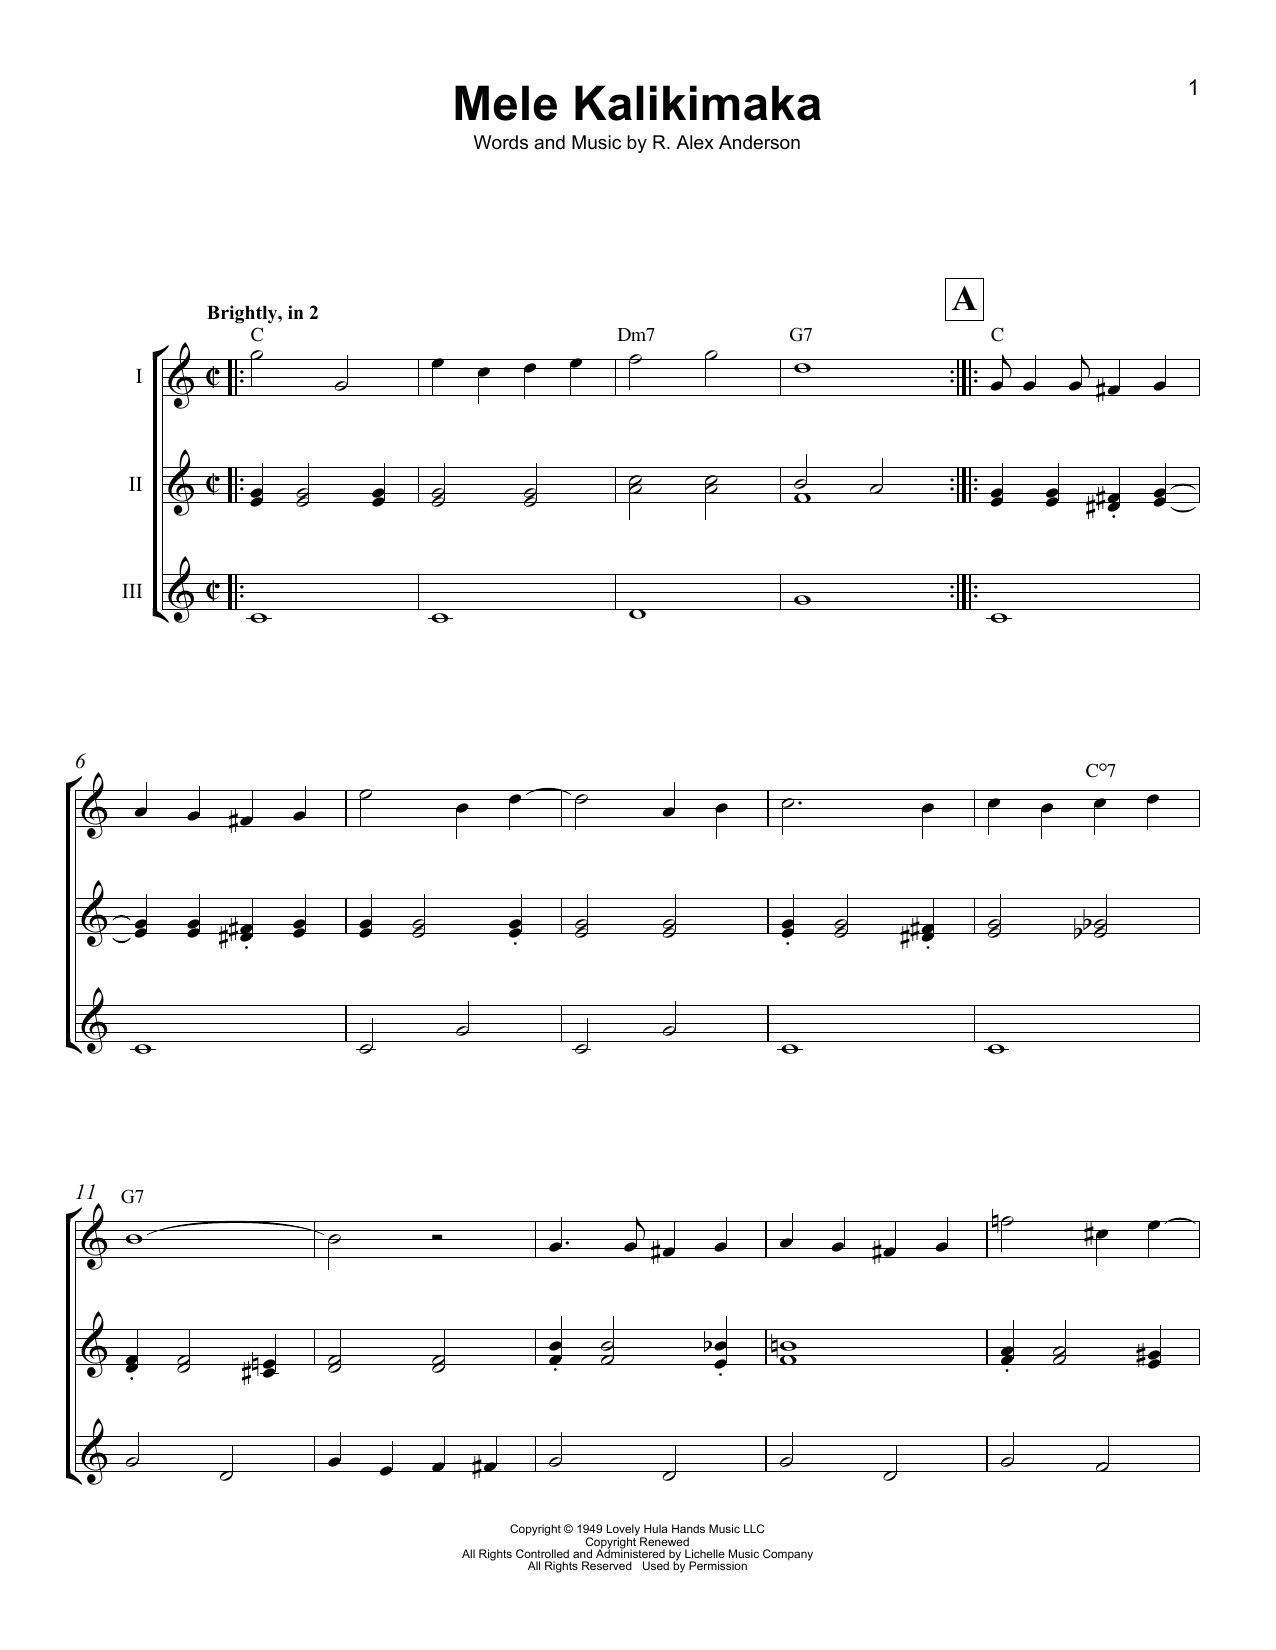 Mele Kalikimaka Sheet Music